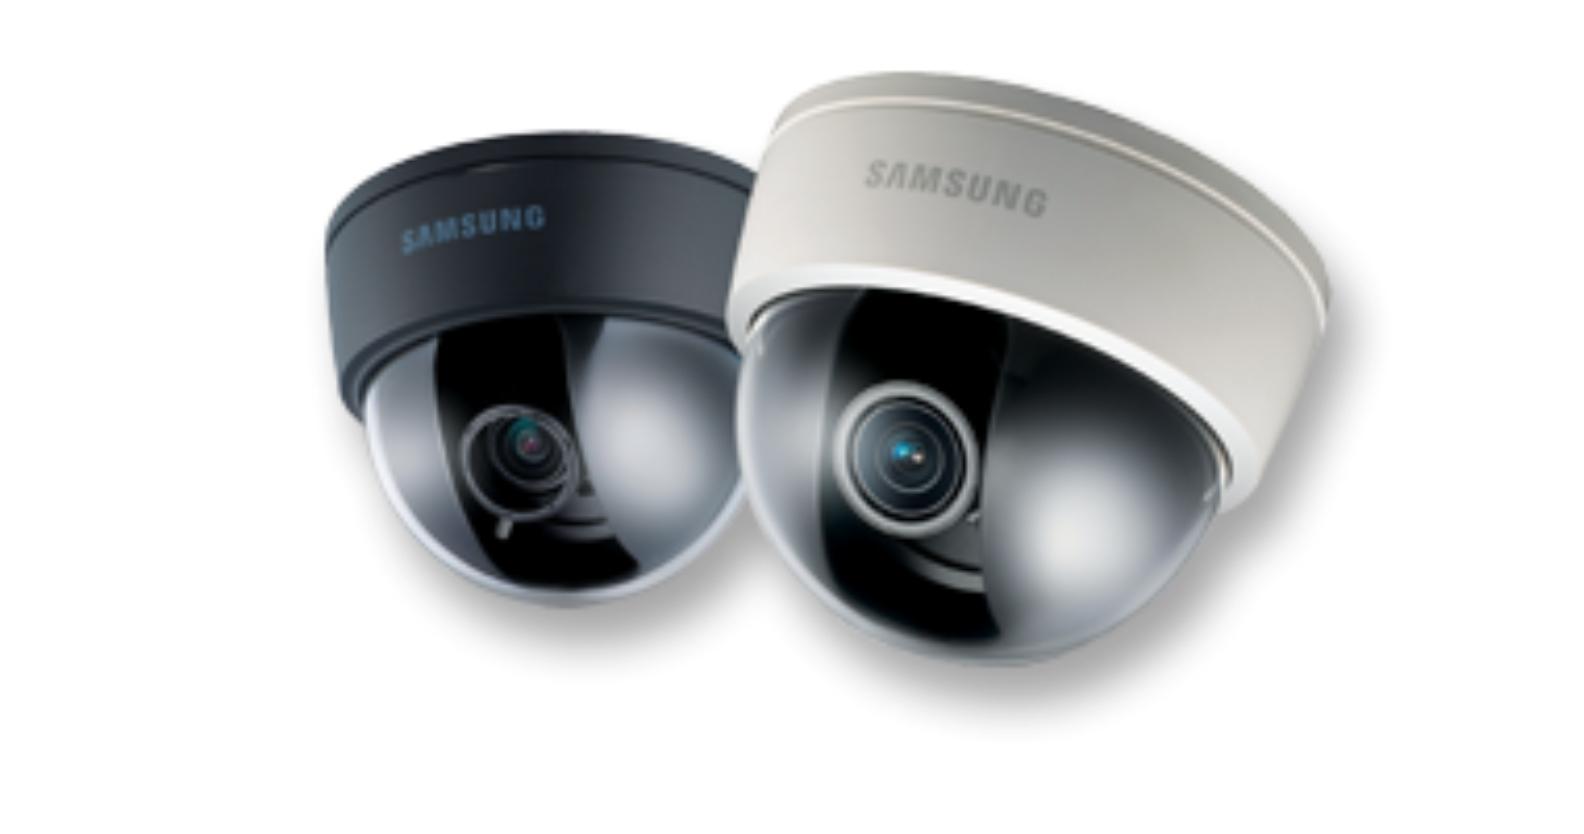 Samsung SNV-3082 IP Camera Driver for Windows Mac